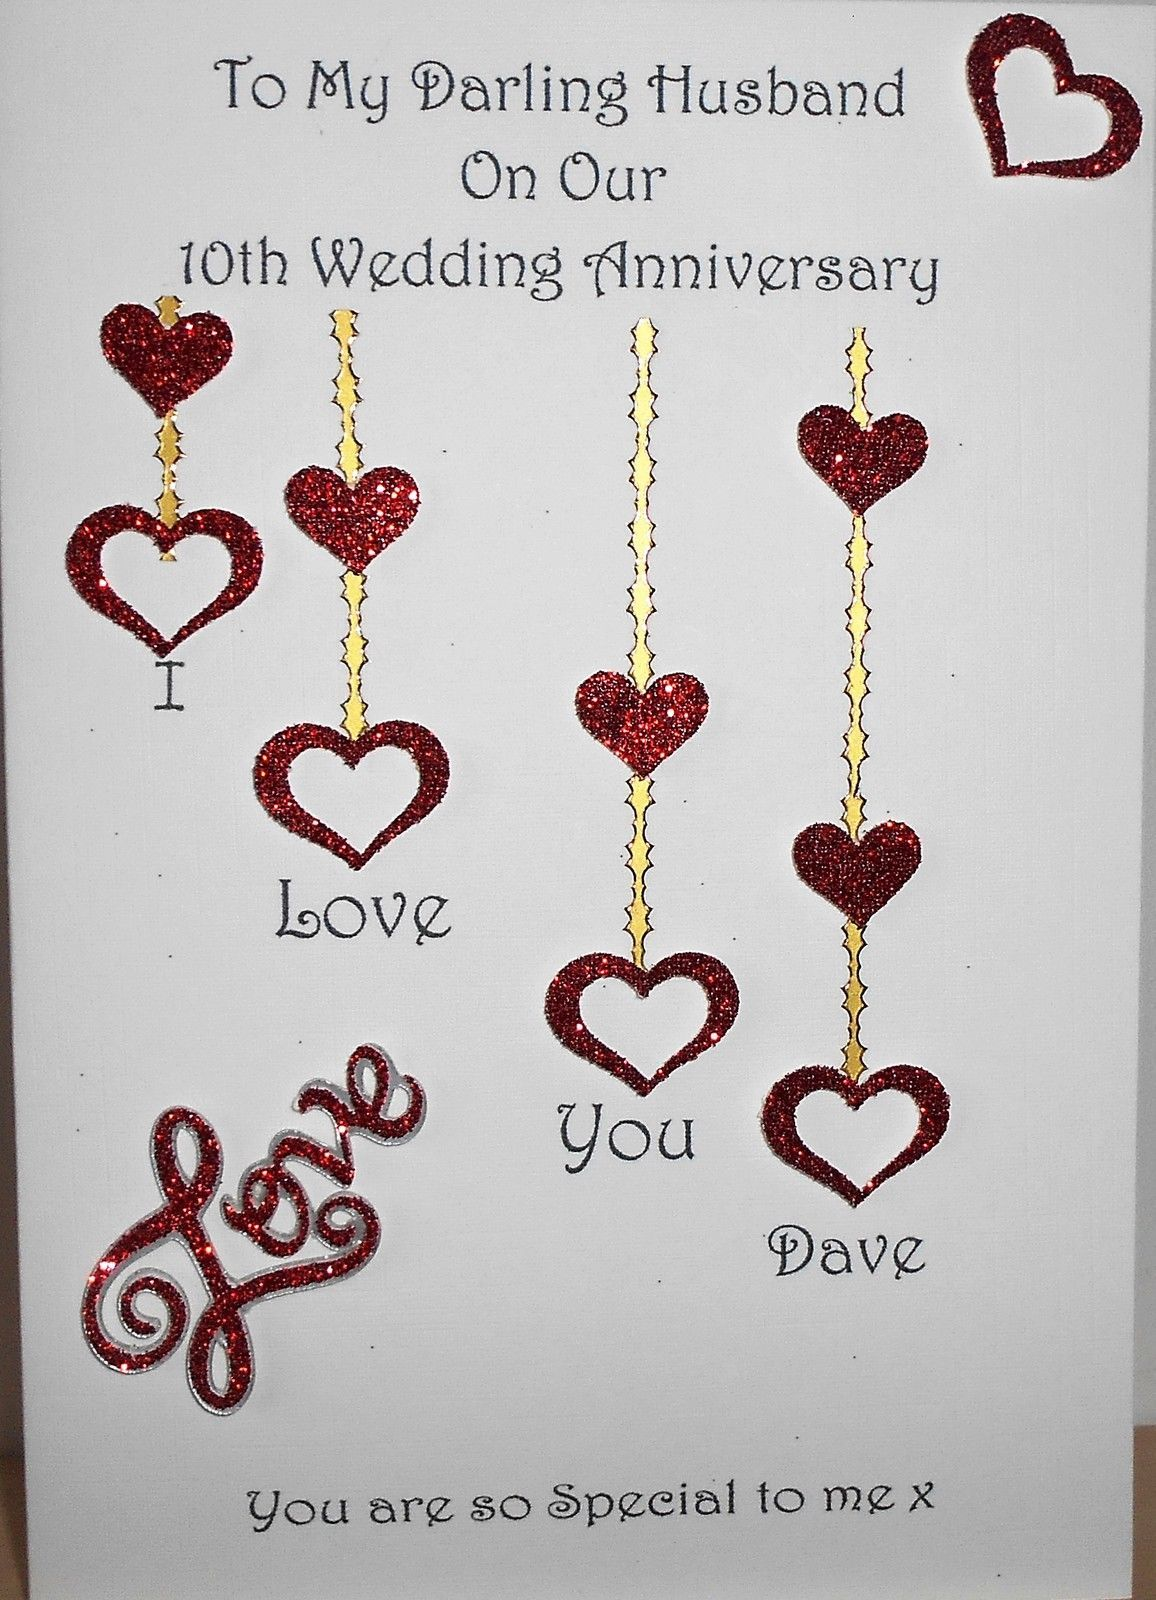 gbp personalised handmade wedding anniversary card wife